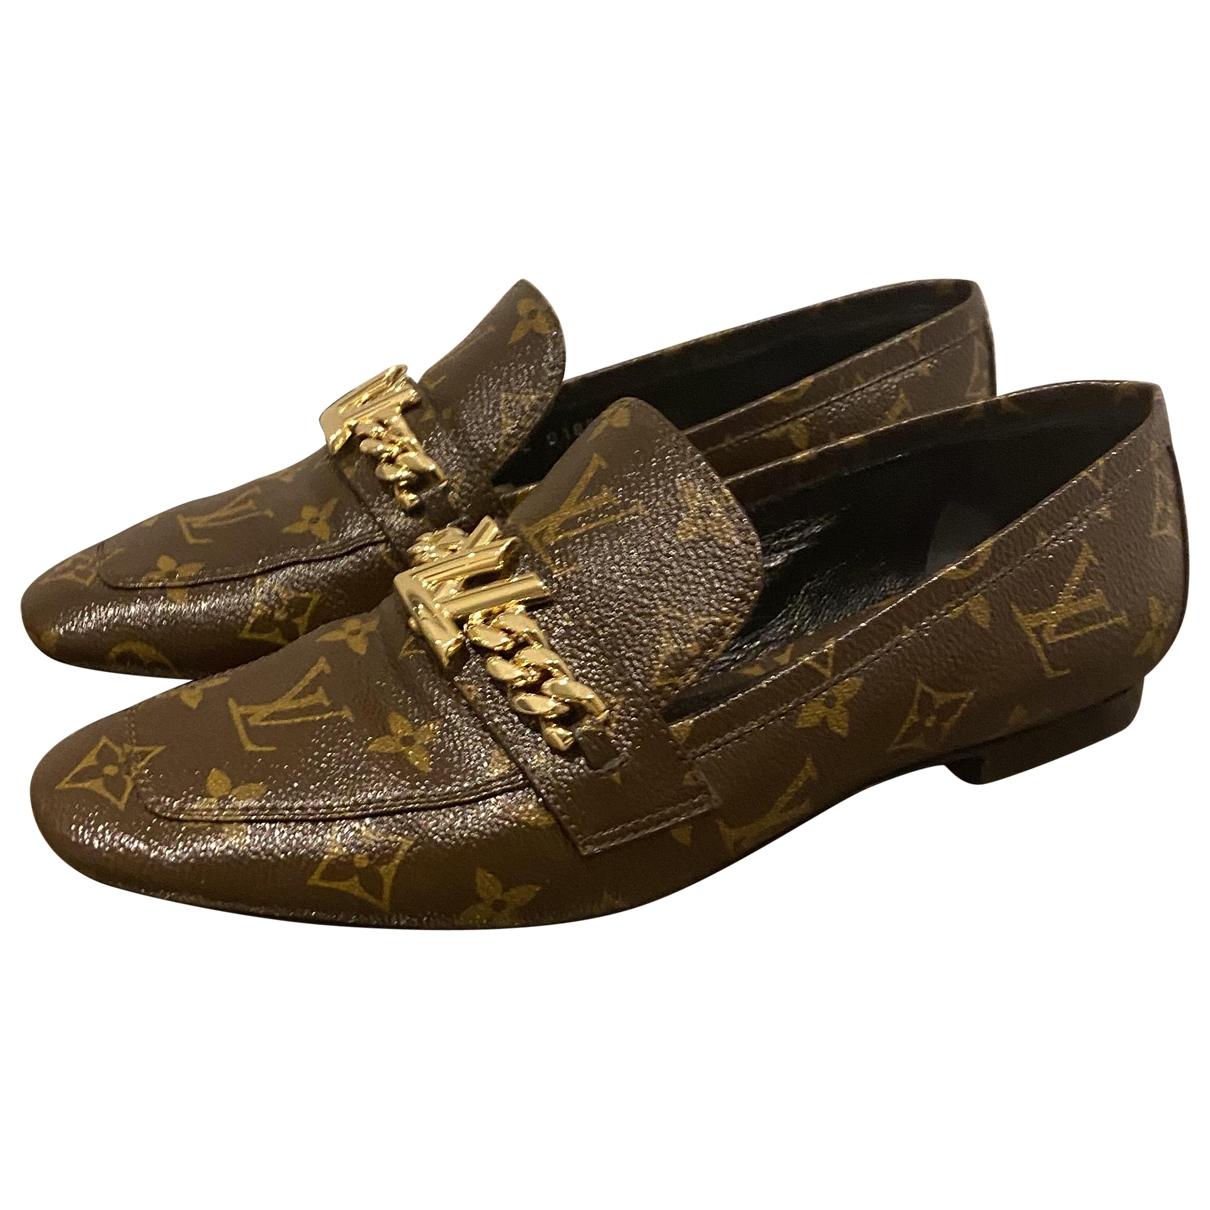 Louis Vuitton Upper Case Brown Leather Flats for Women 40 EU